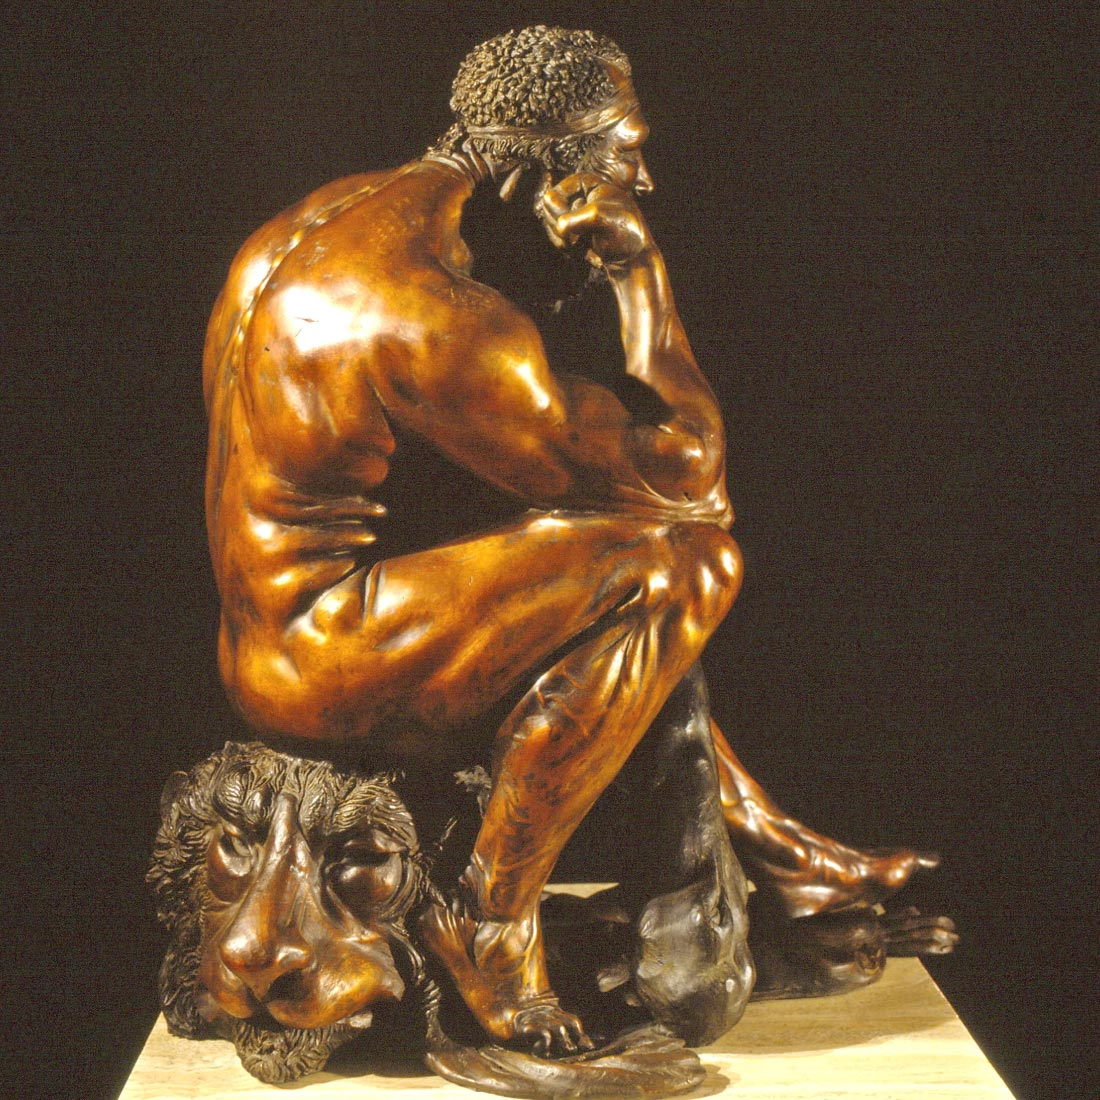 Ercole/Hercules